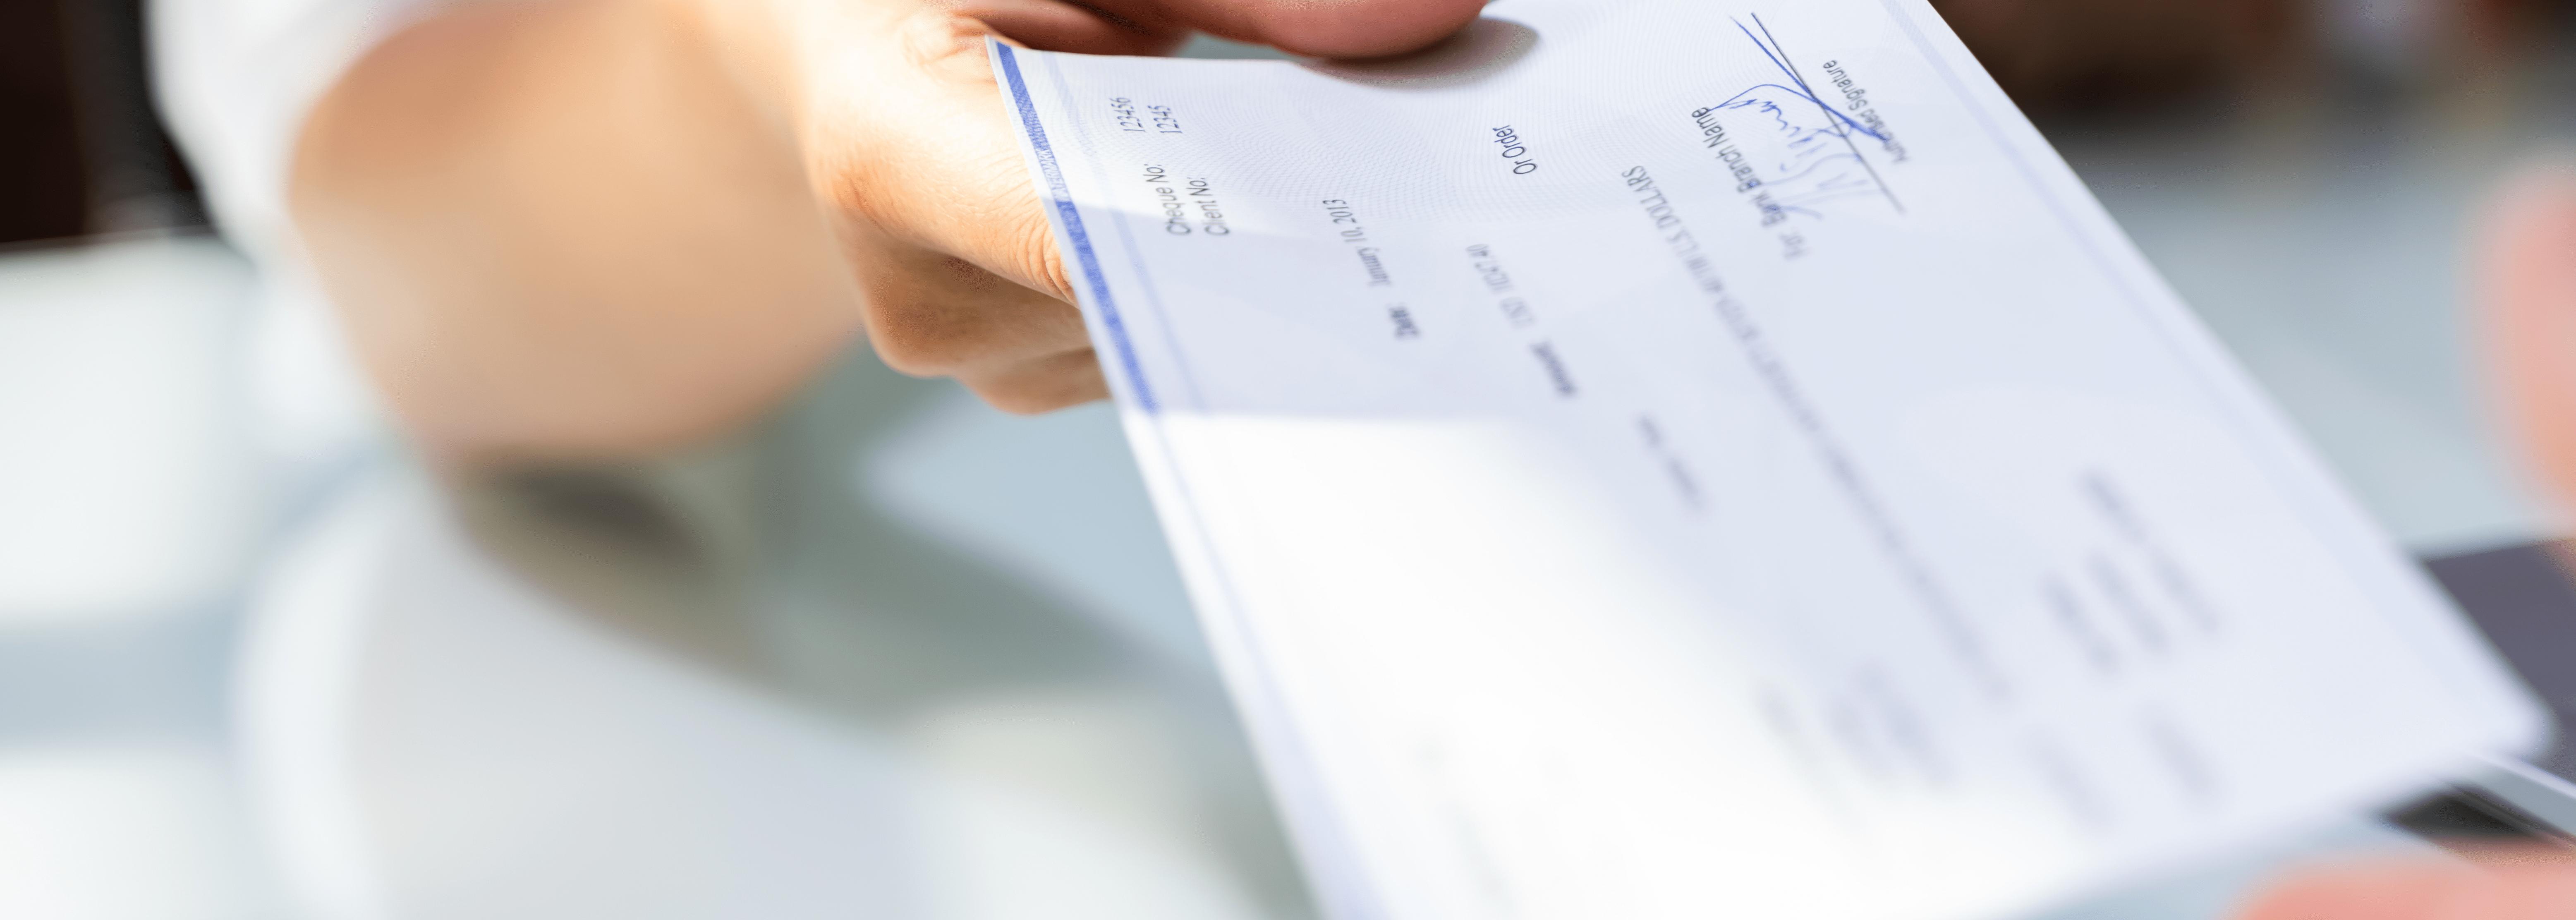 Signed Check using system like AP/PR Laser Checks